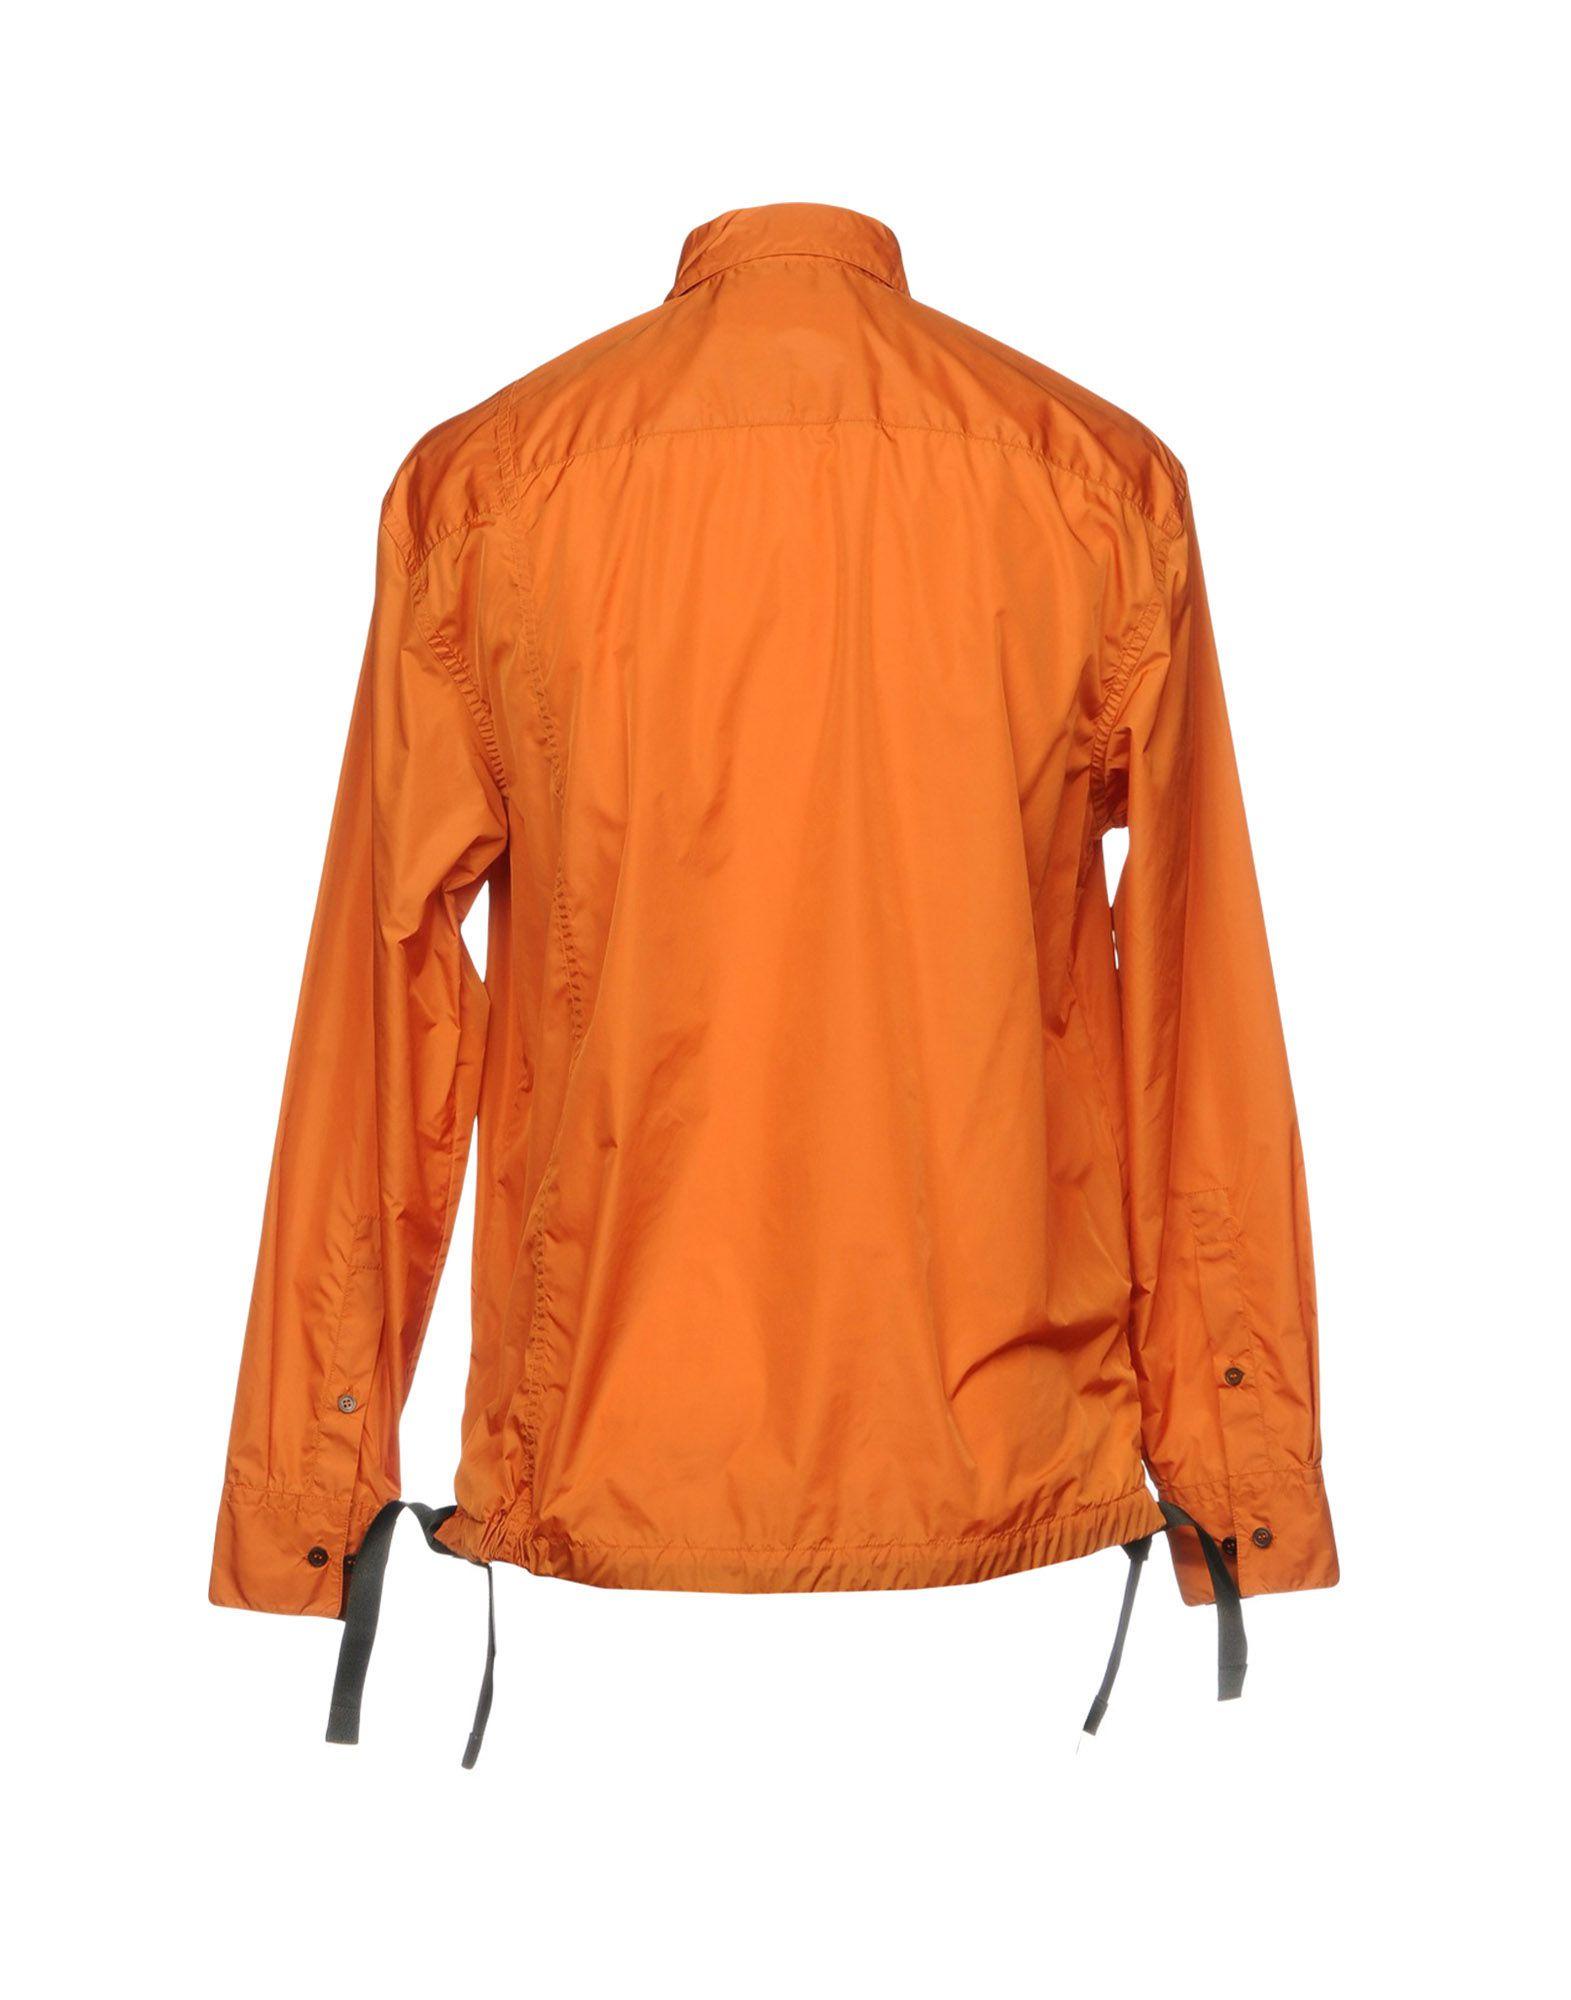 Camicia Unita Tinta Unita Camicia Marni Uomo - 38686058VW d2826a